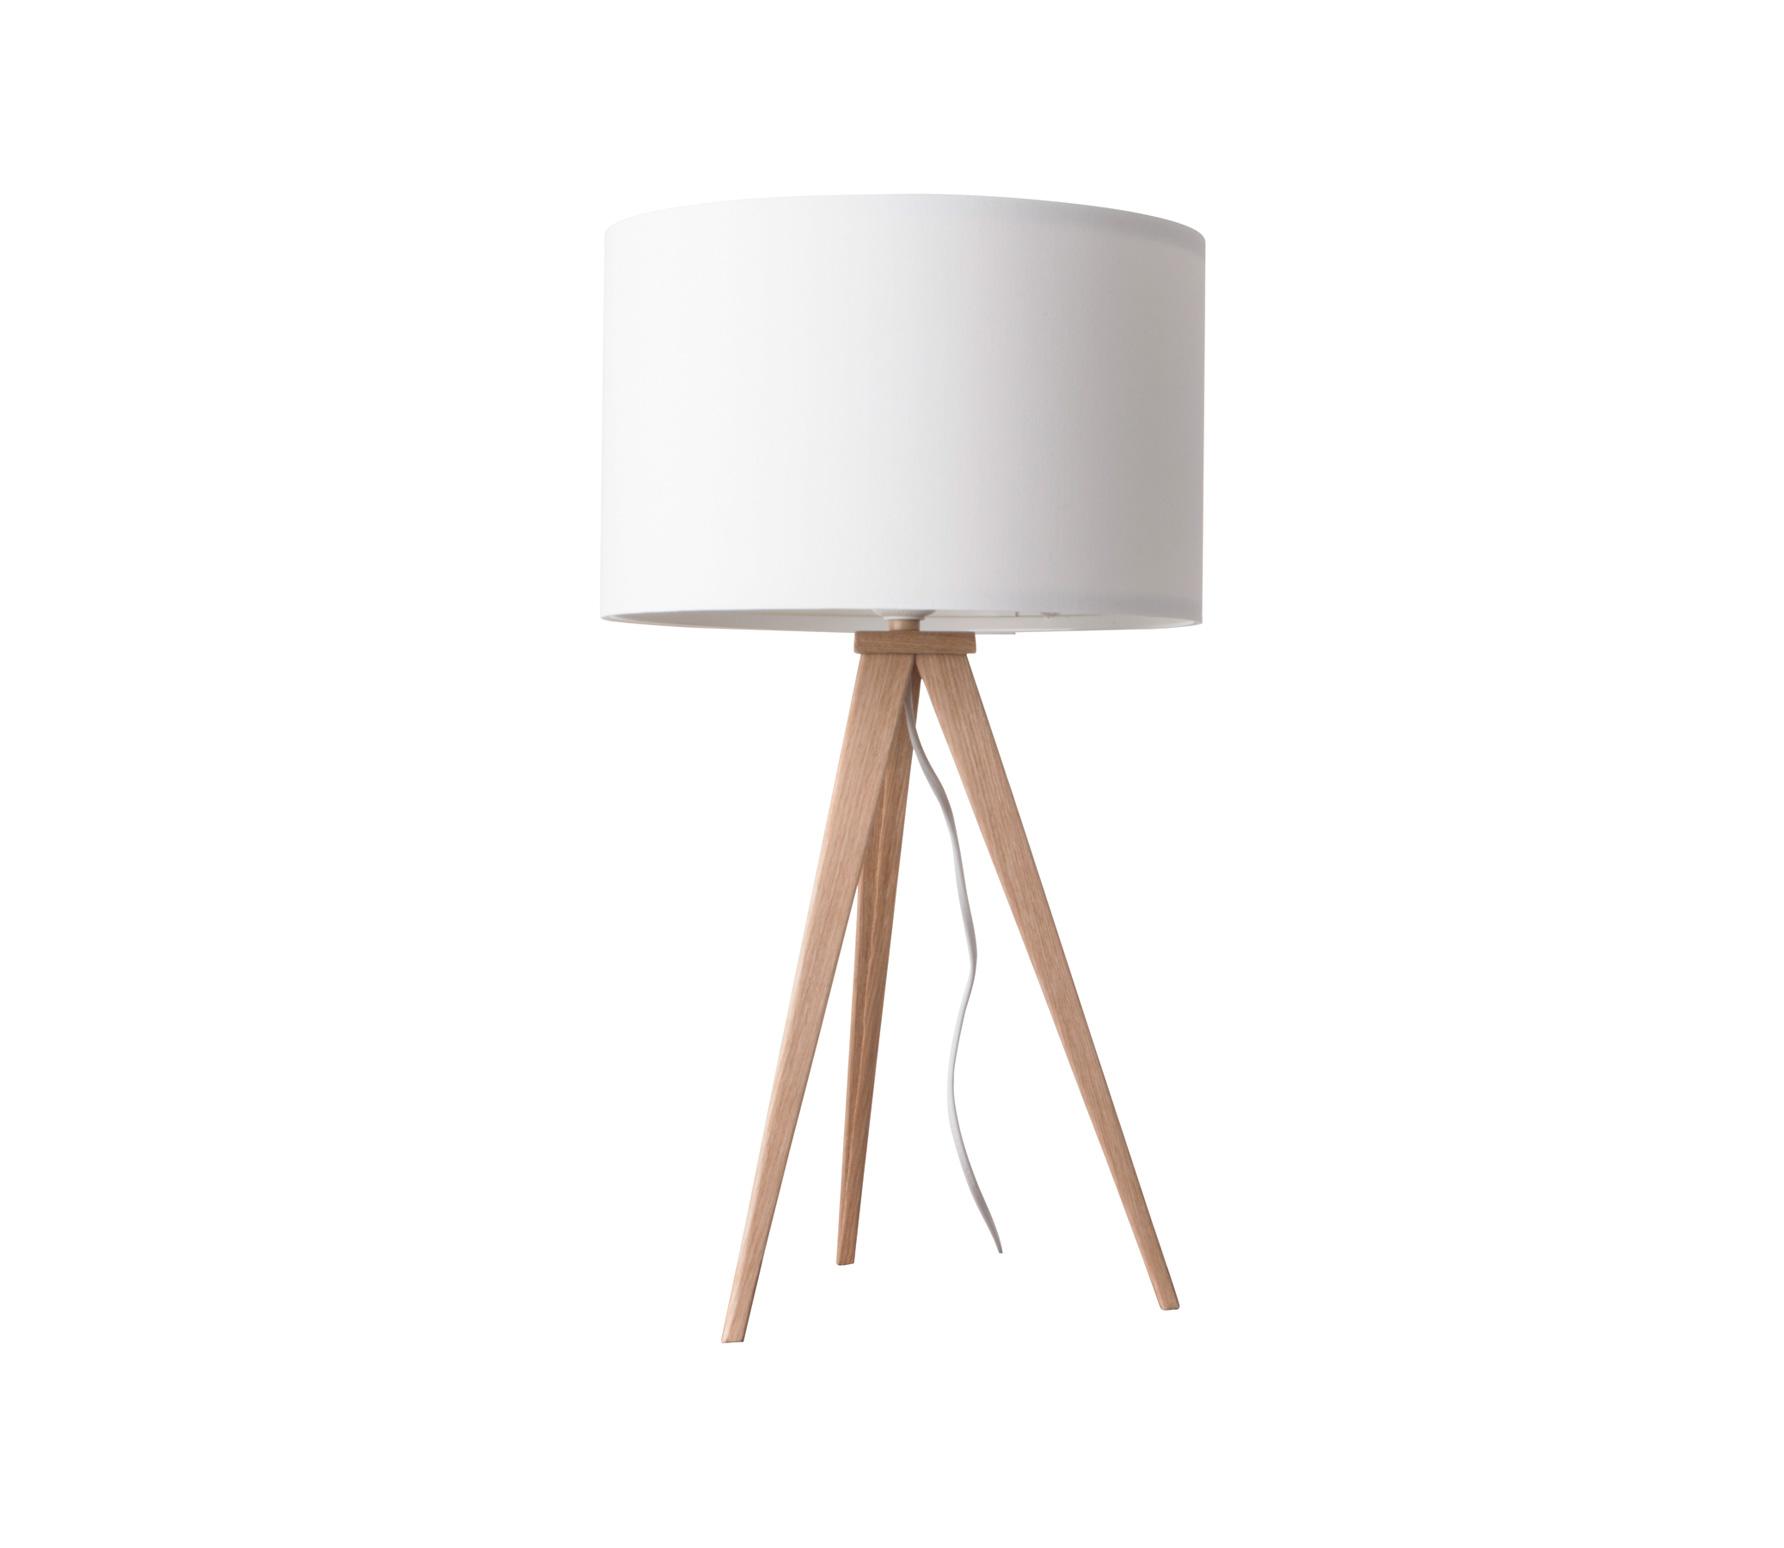 Zuiver Tripod tafellamp hout/stof blank/wit